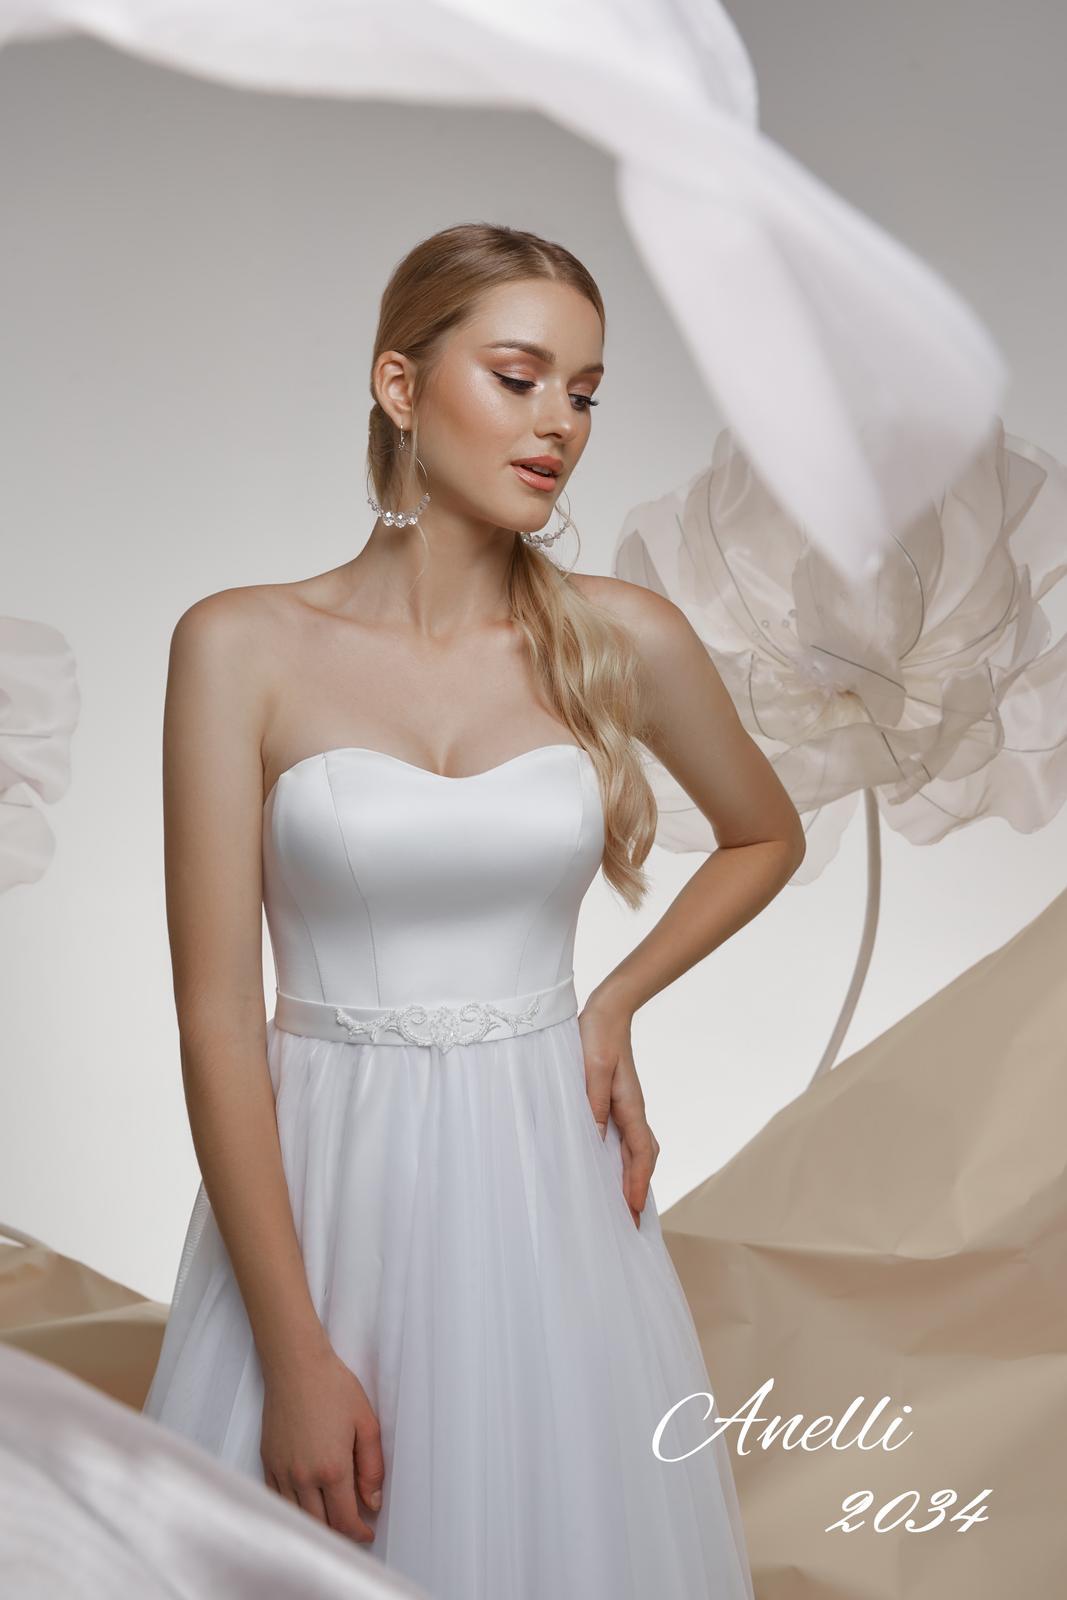 Svadobné šaty - Imagine 2034 - Obrázok č. 2